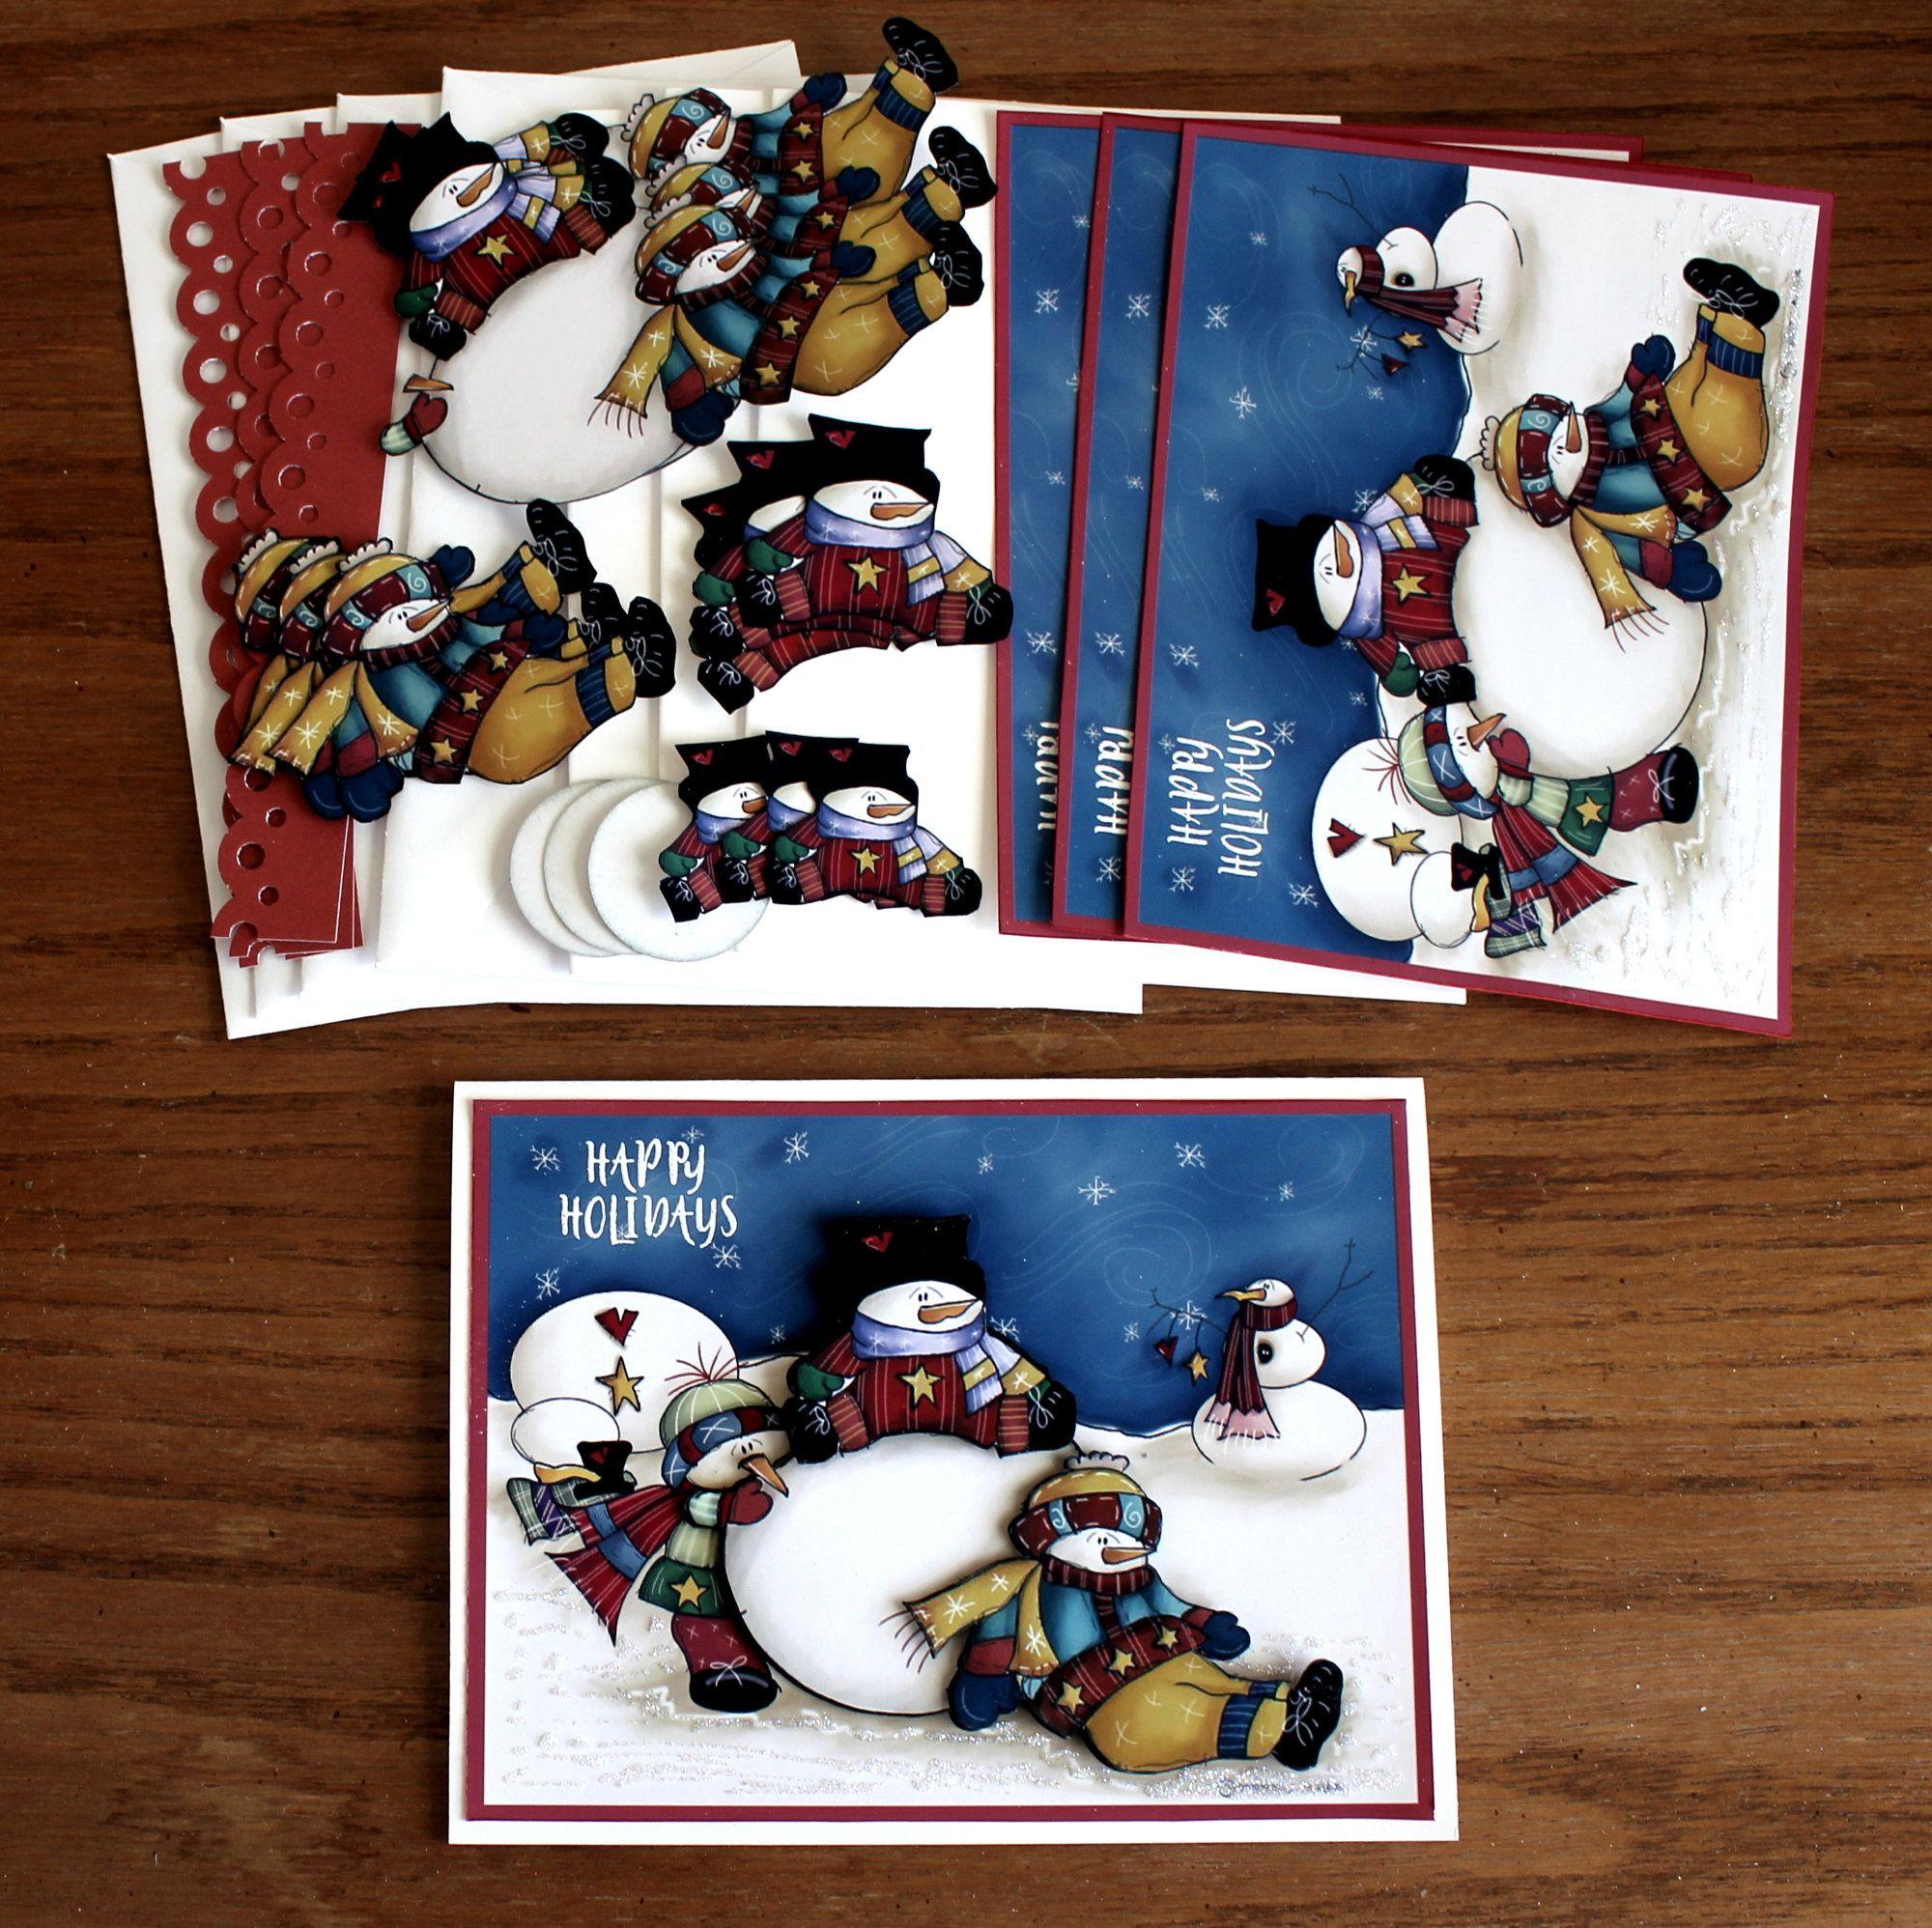 Diy Card Kit Handmade Greeting Cards Greeting Card Kit Etsy Greeting Card Kits Handmade Card Kits Greeting Cards Handmade